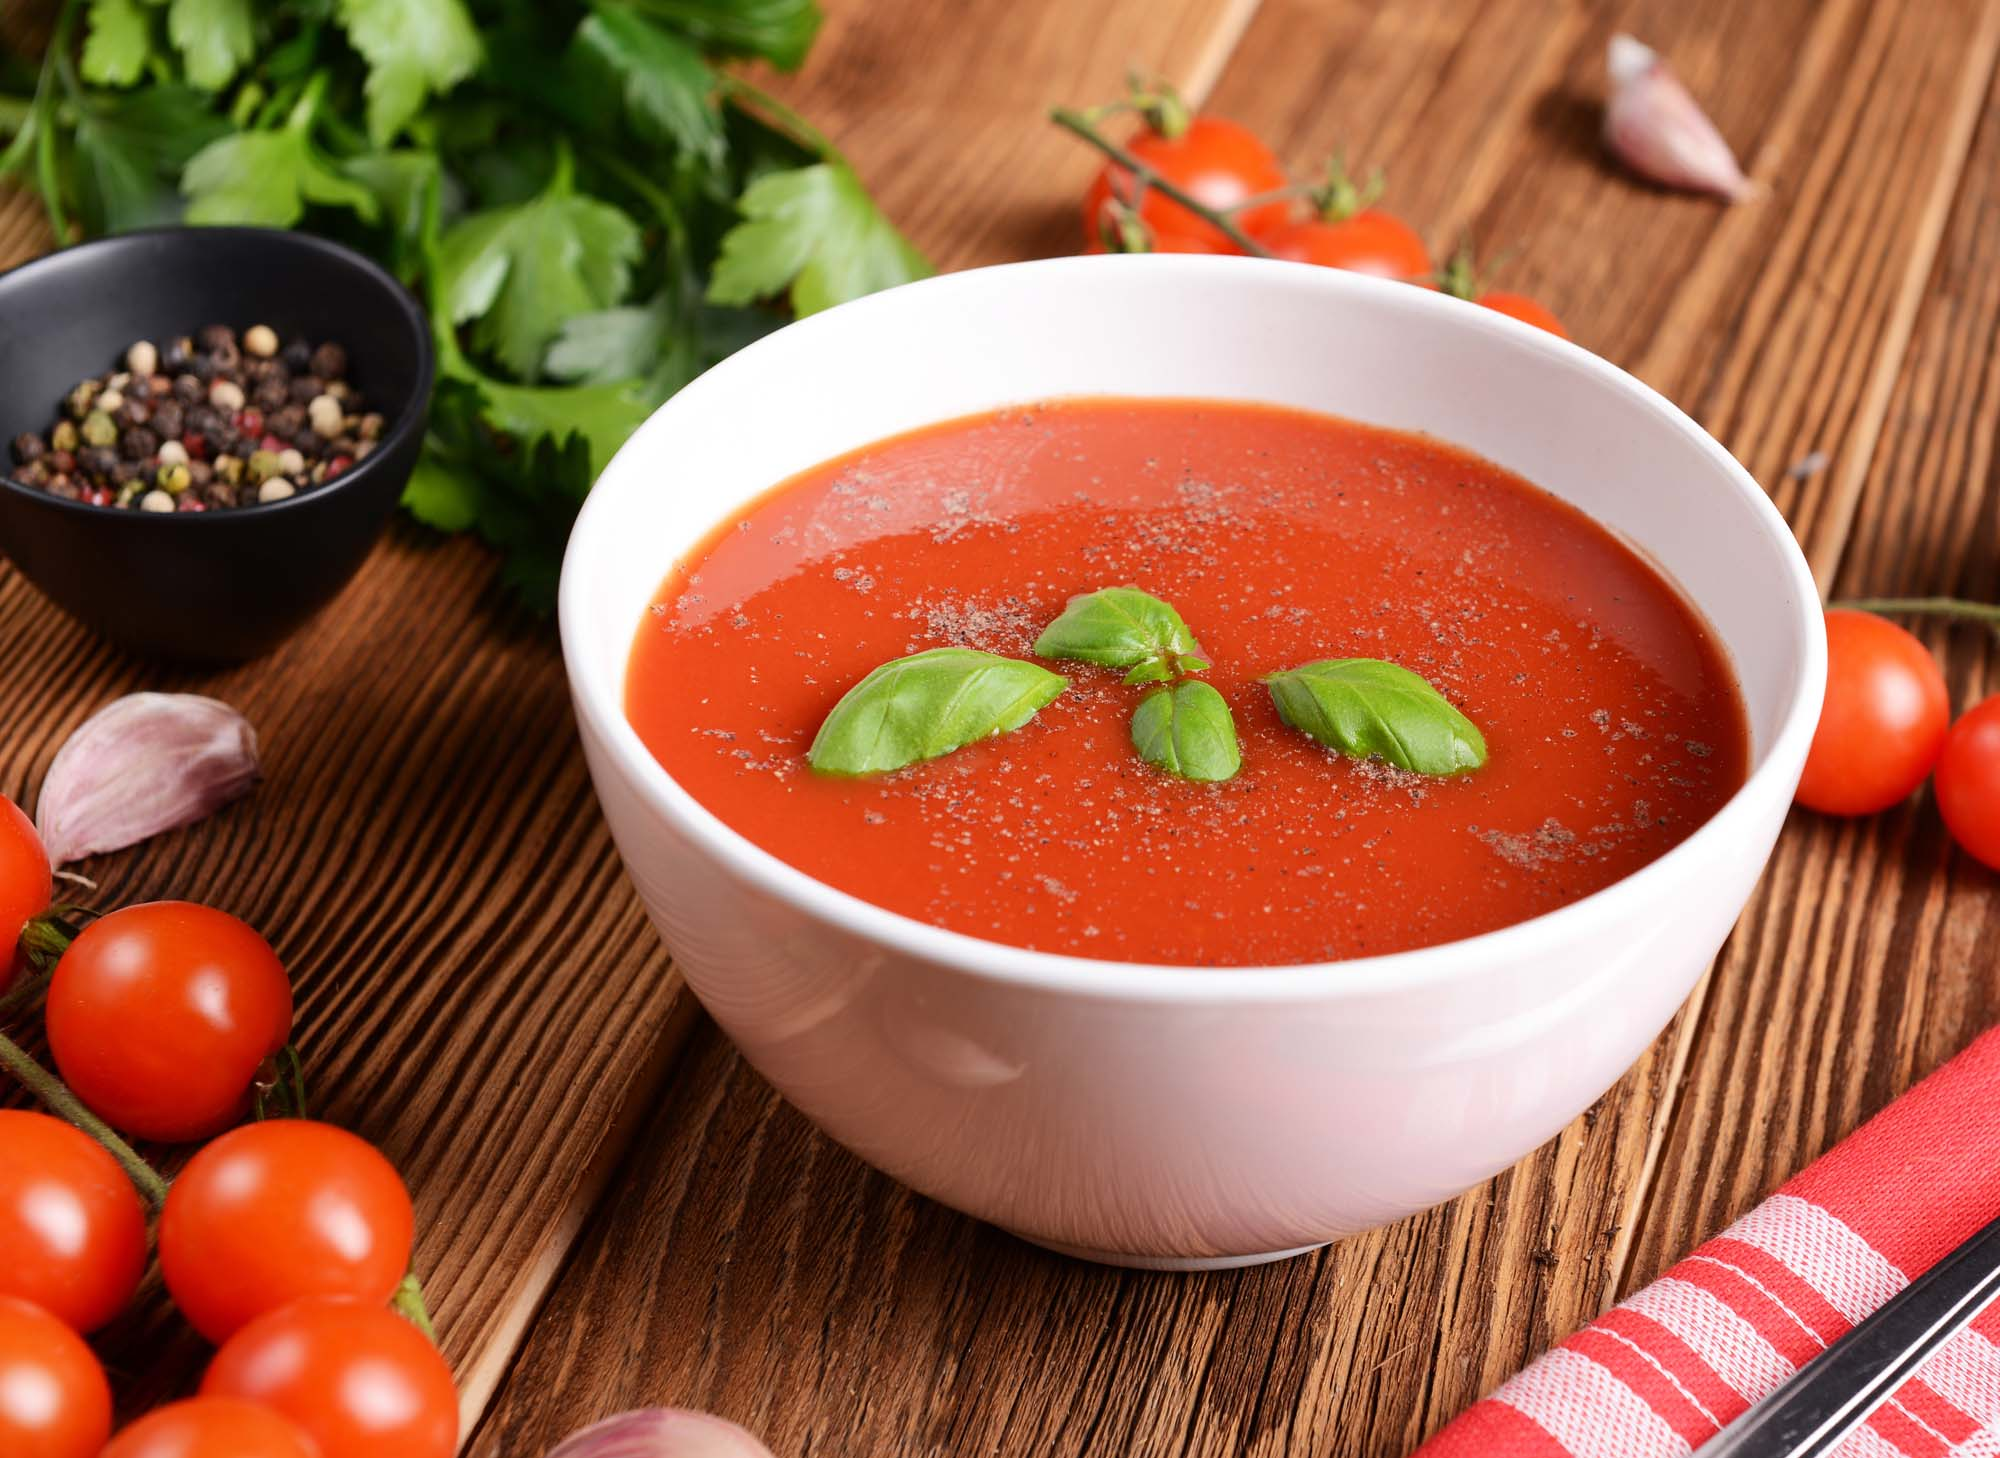 Melbye-Mortensens tomatsuppe